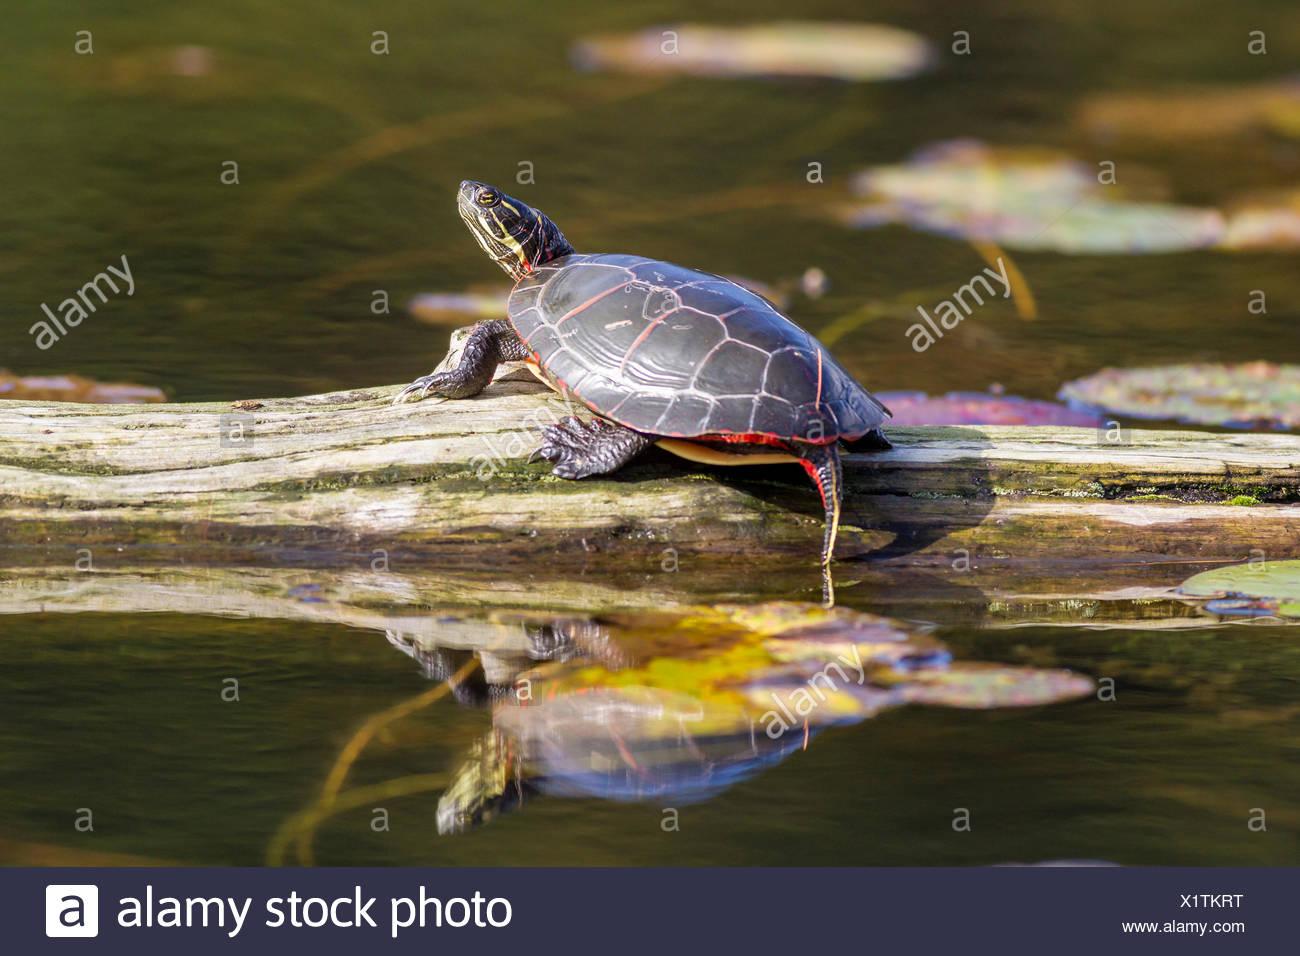 Midland tortuga pintada (Chrysemys picta marginata), Killarney provincial park, Ontario, Canadá Imagen De Stock